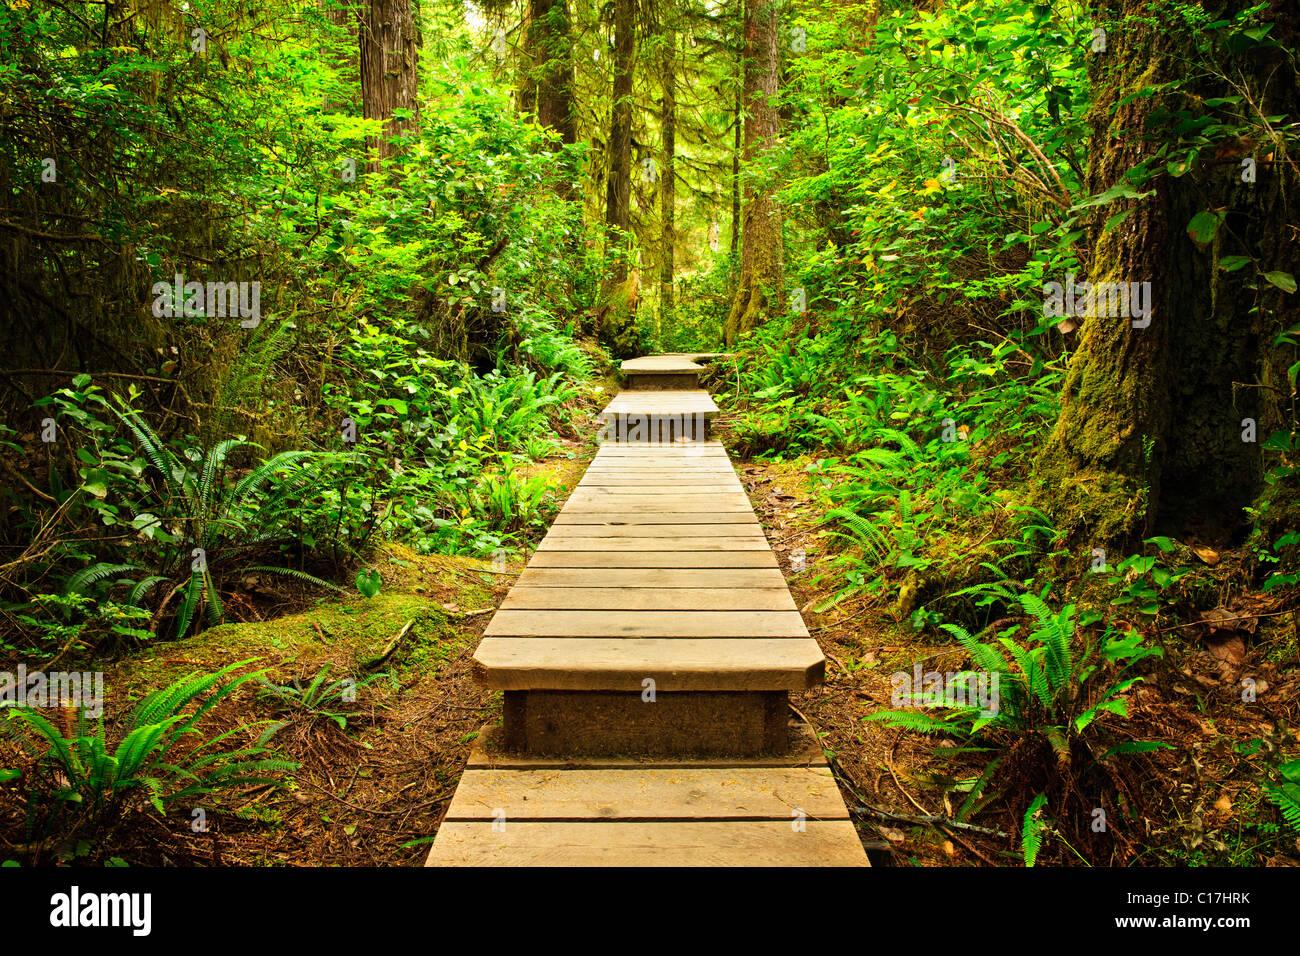 Wooden path through temperate rain forest. Pacific Rim National Park, British Columbia Canada Stock Photo